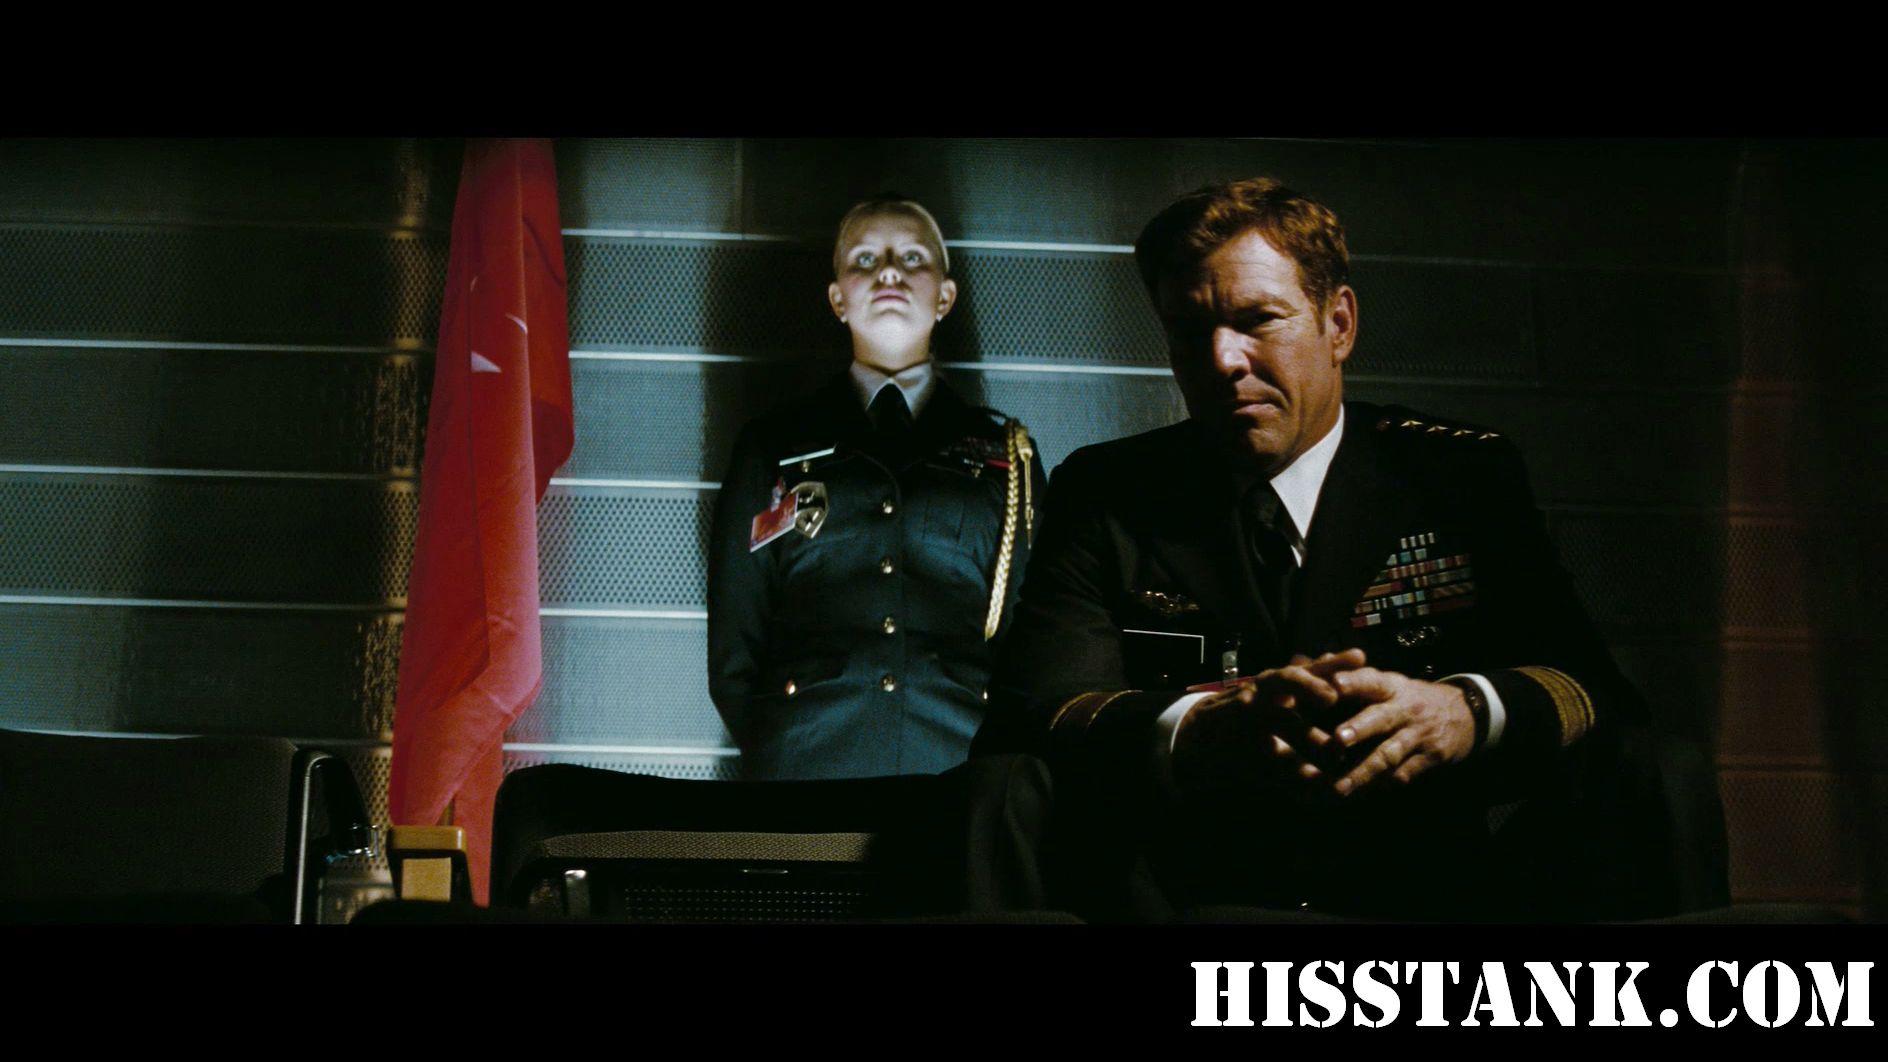 GI JOE 2 Retaliation Trailer 2  2013 Movie  Official HD